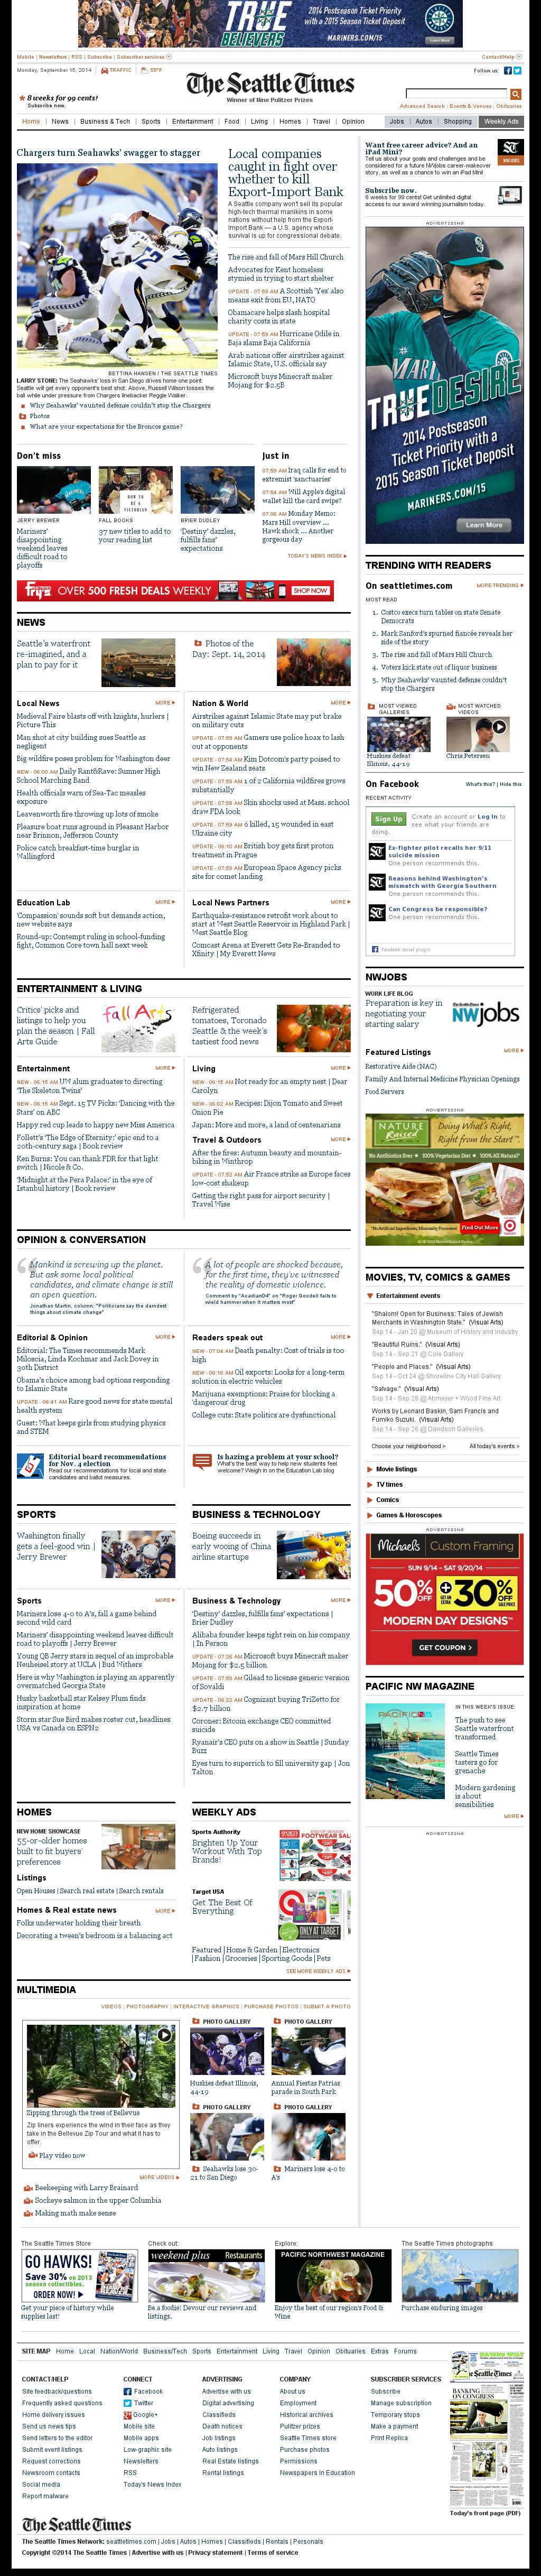 The Seattle Times at Monday Sept. 15, 2014, 3:17 p.m. UTC